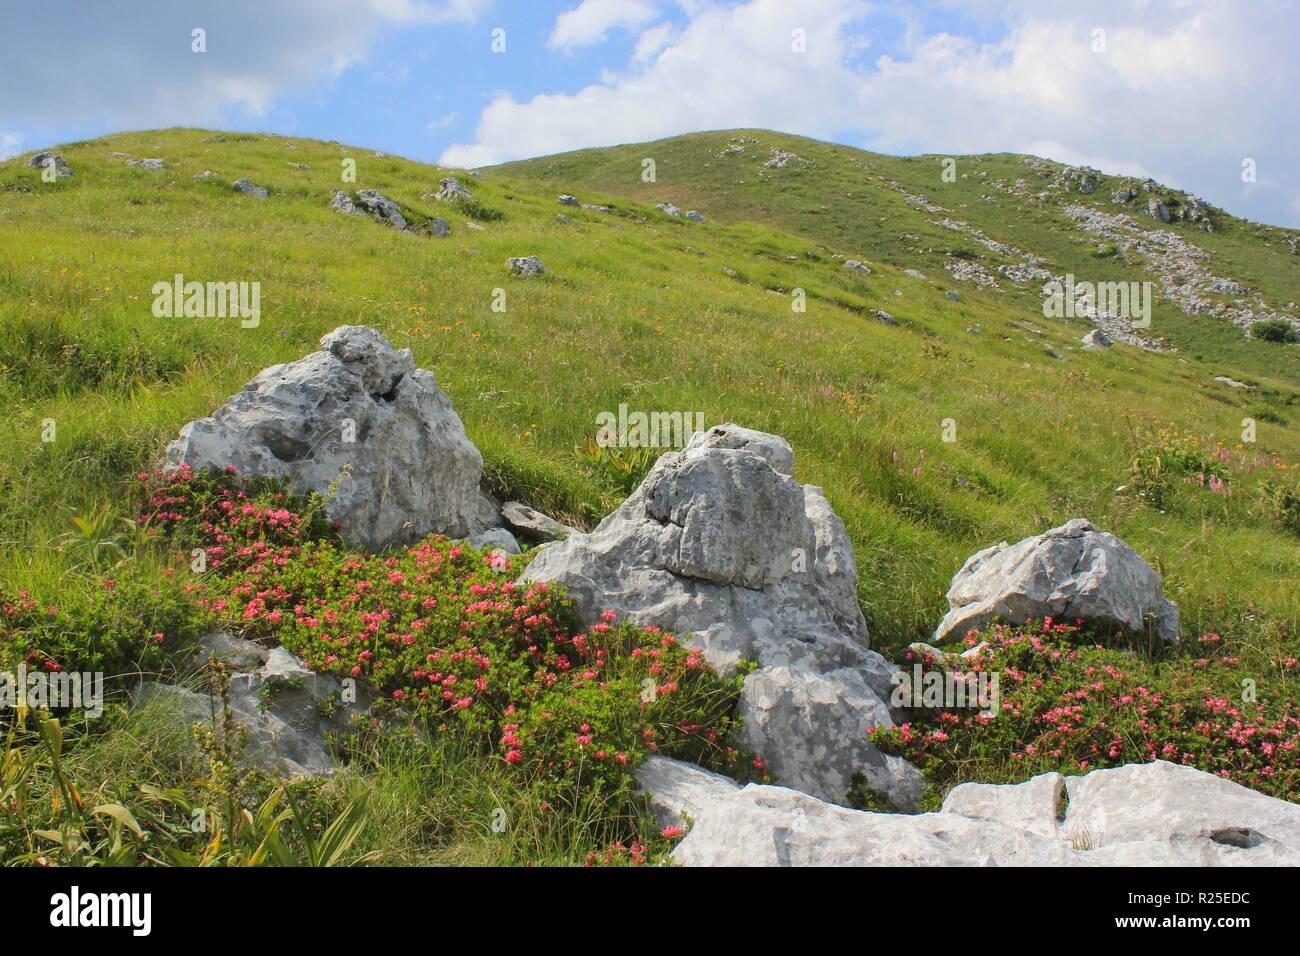 Great Laurel flowers (rhododendron) alpine pasture landscape on Mount Kobariski Stol, Julian Alps, Alpe Adria trail, Slovenia, central Europe - Stock Image